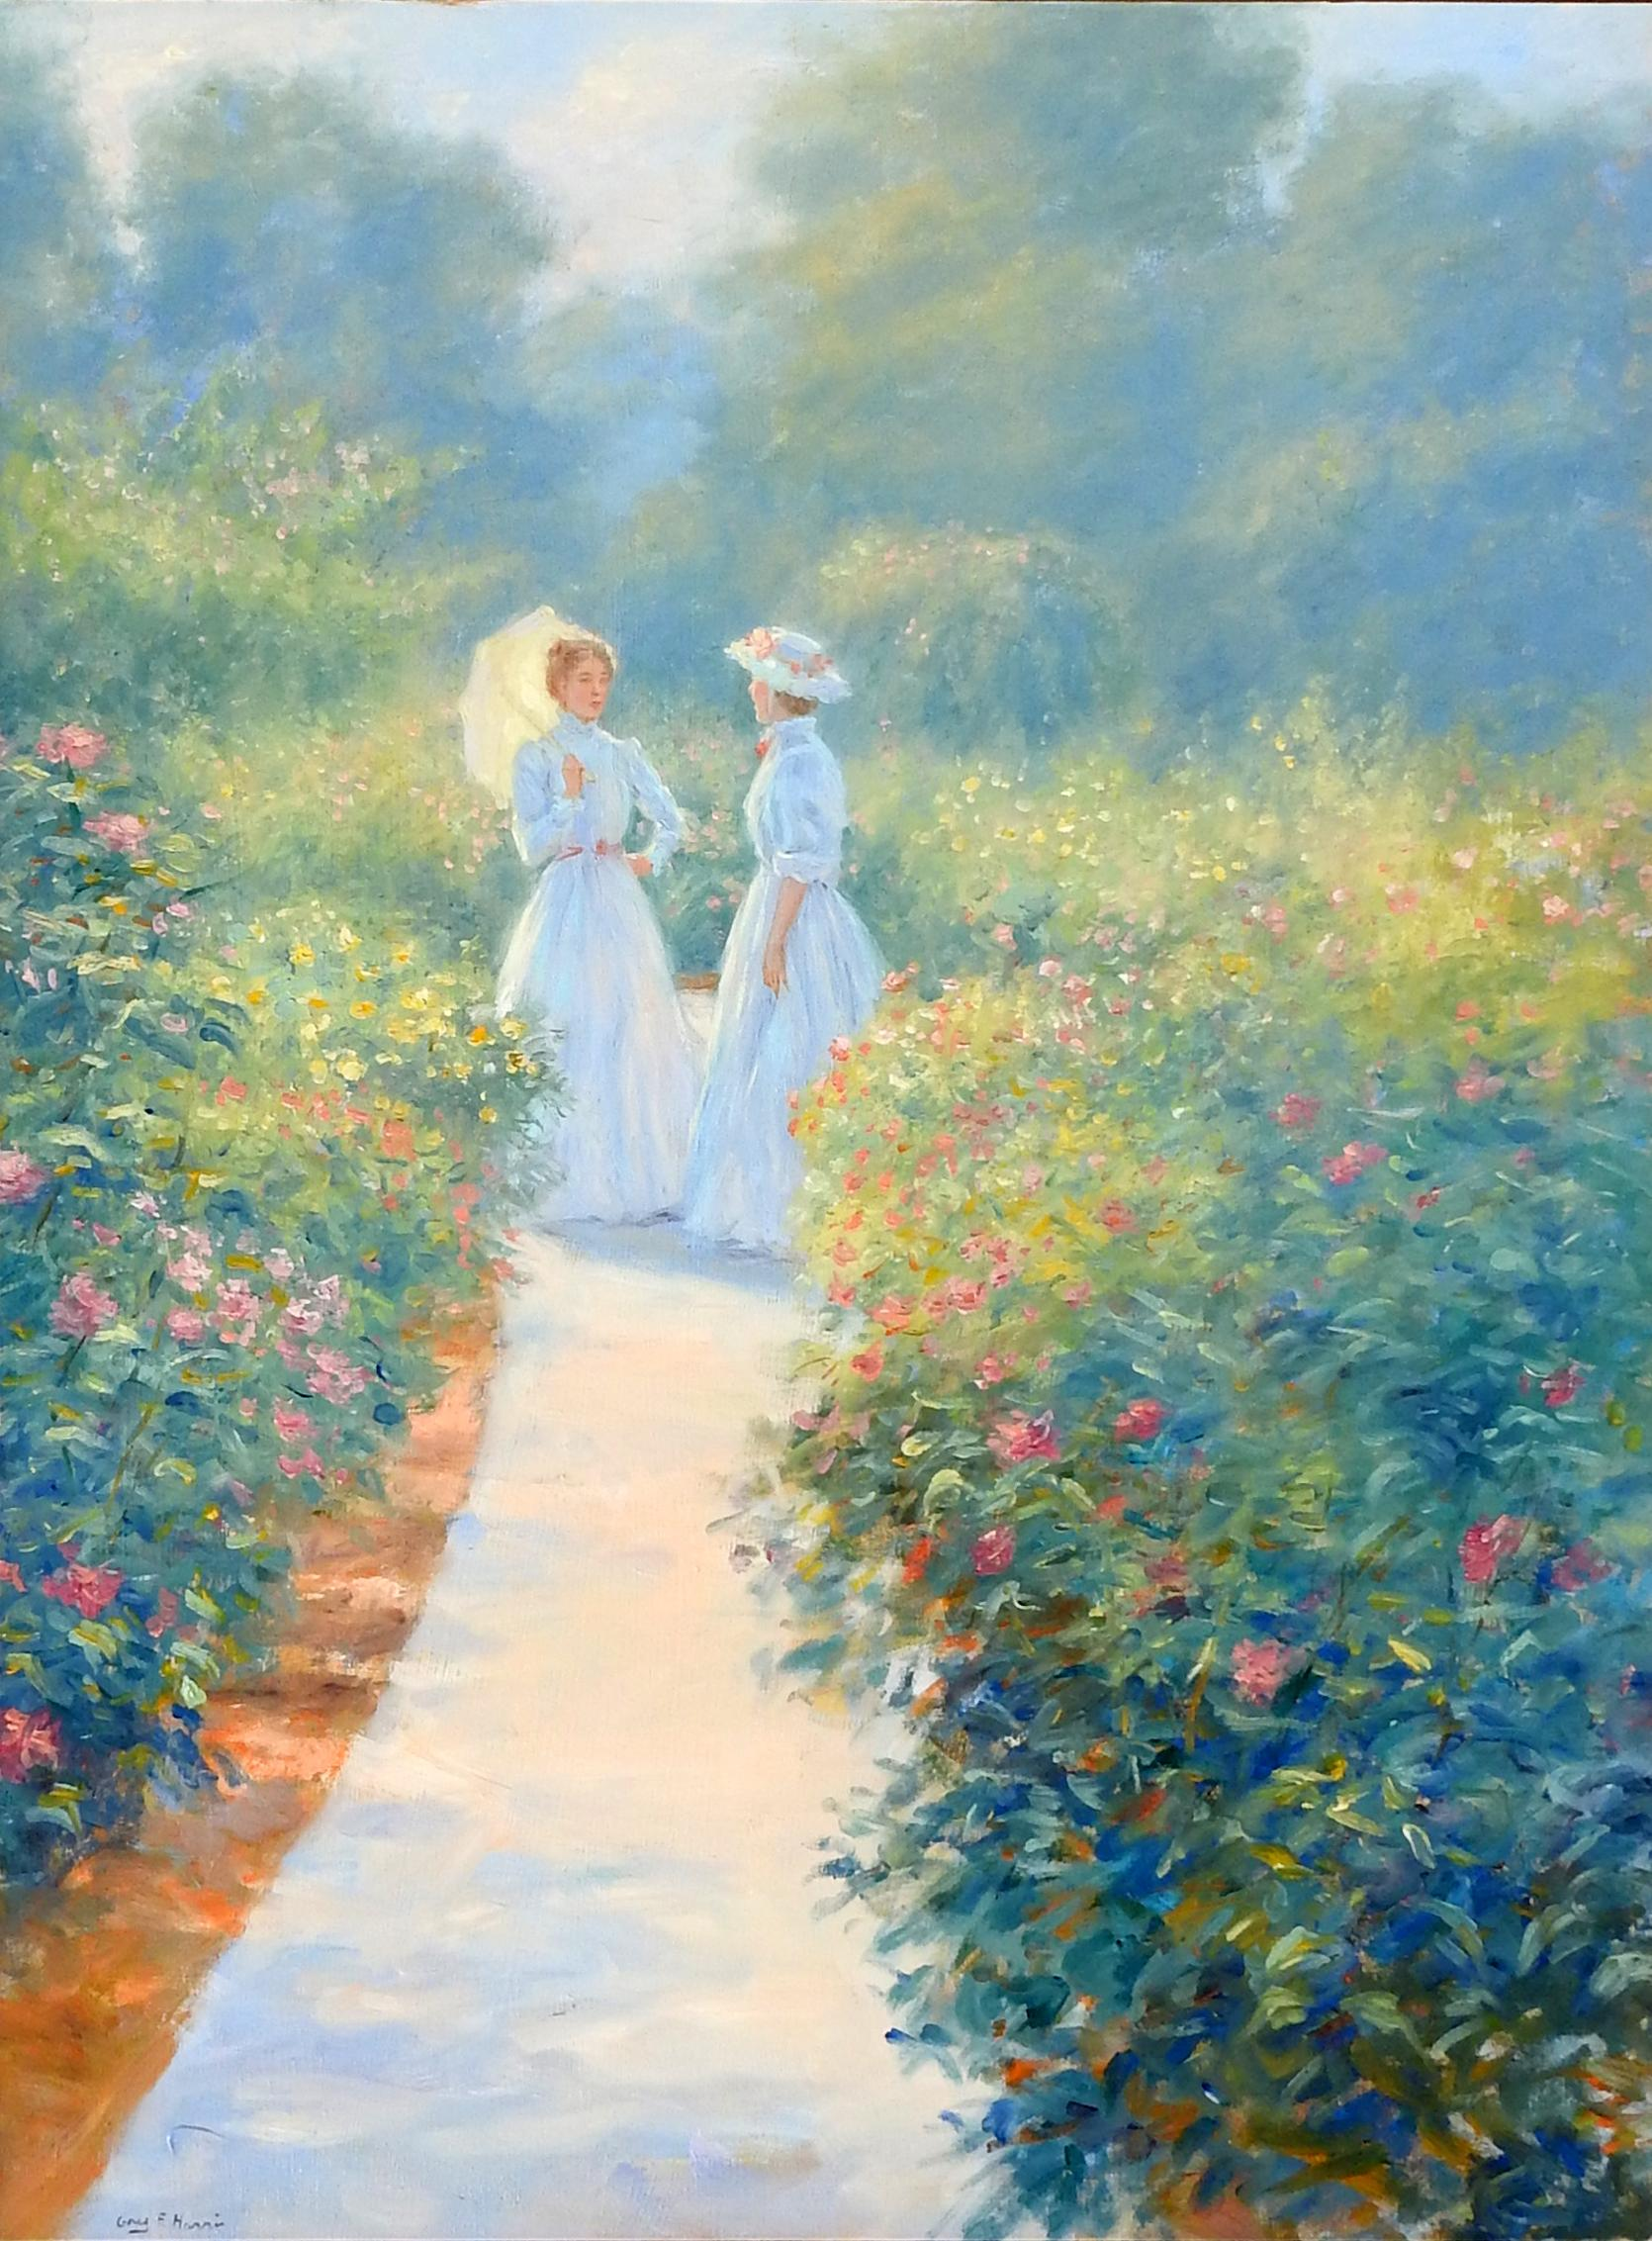 """Good Morning"", Greg Harris, Original Oil, Figurative, Landscape, 40x30 in."